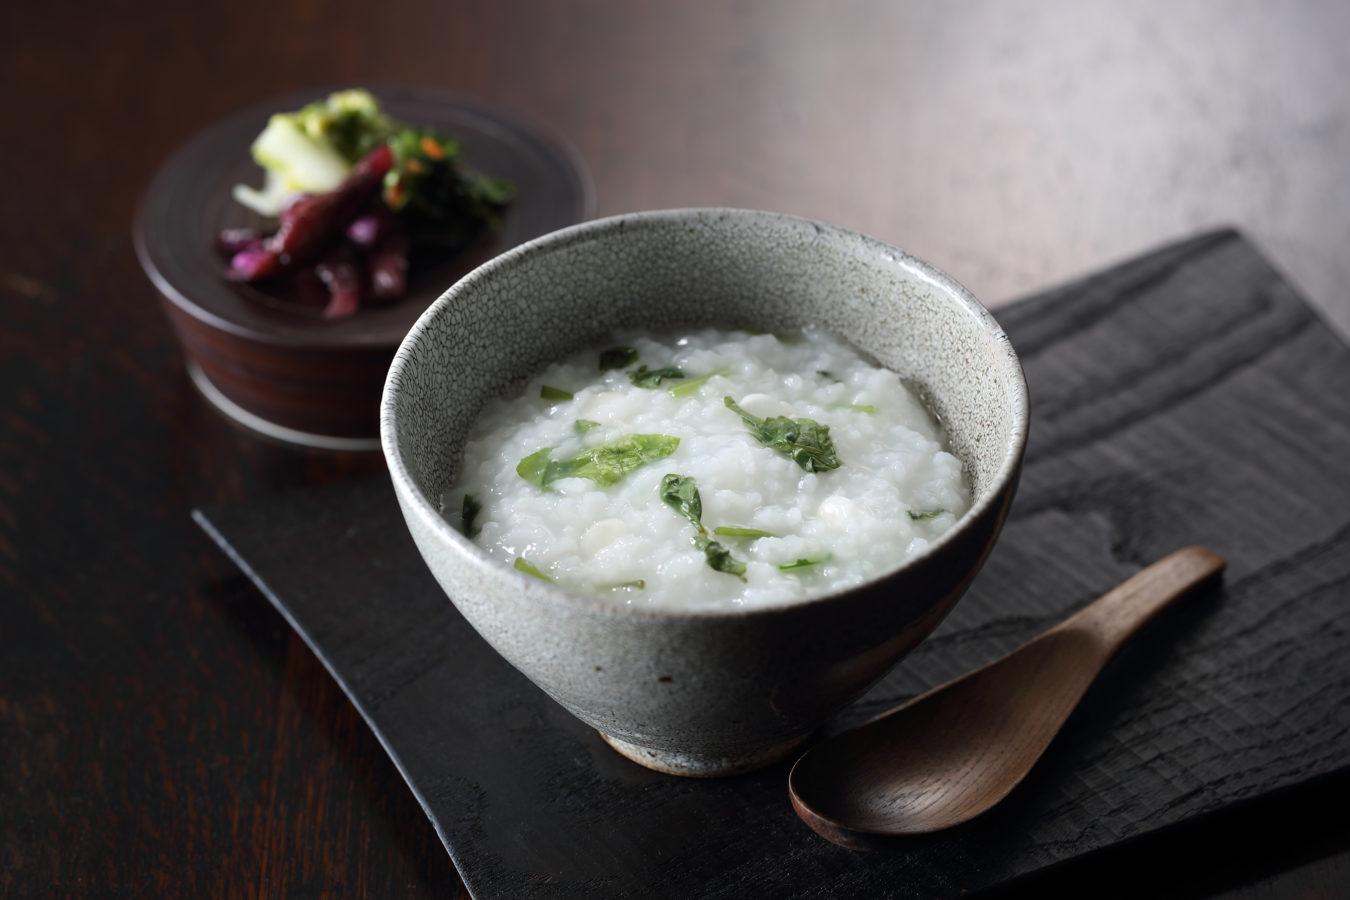 Nanakusa Gayu - Seven Herb Rice Porridge